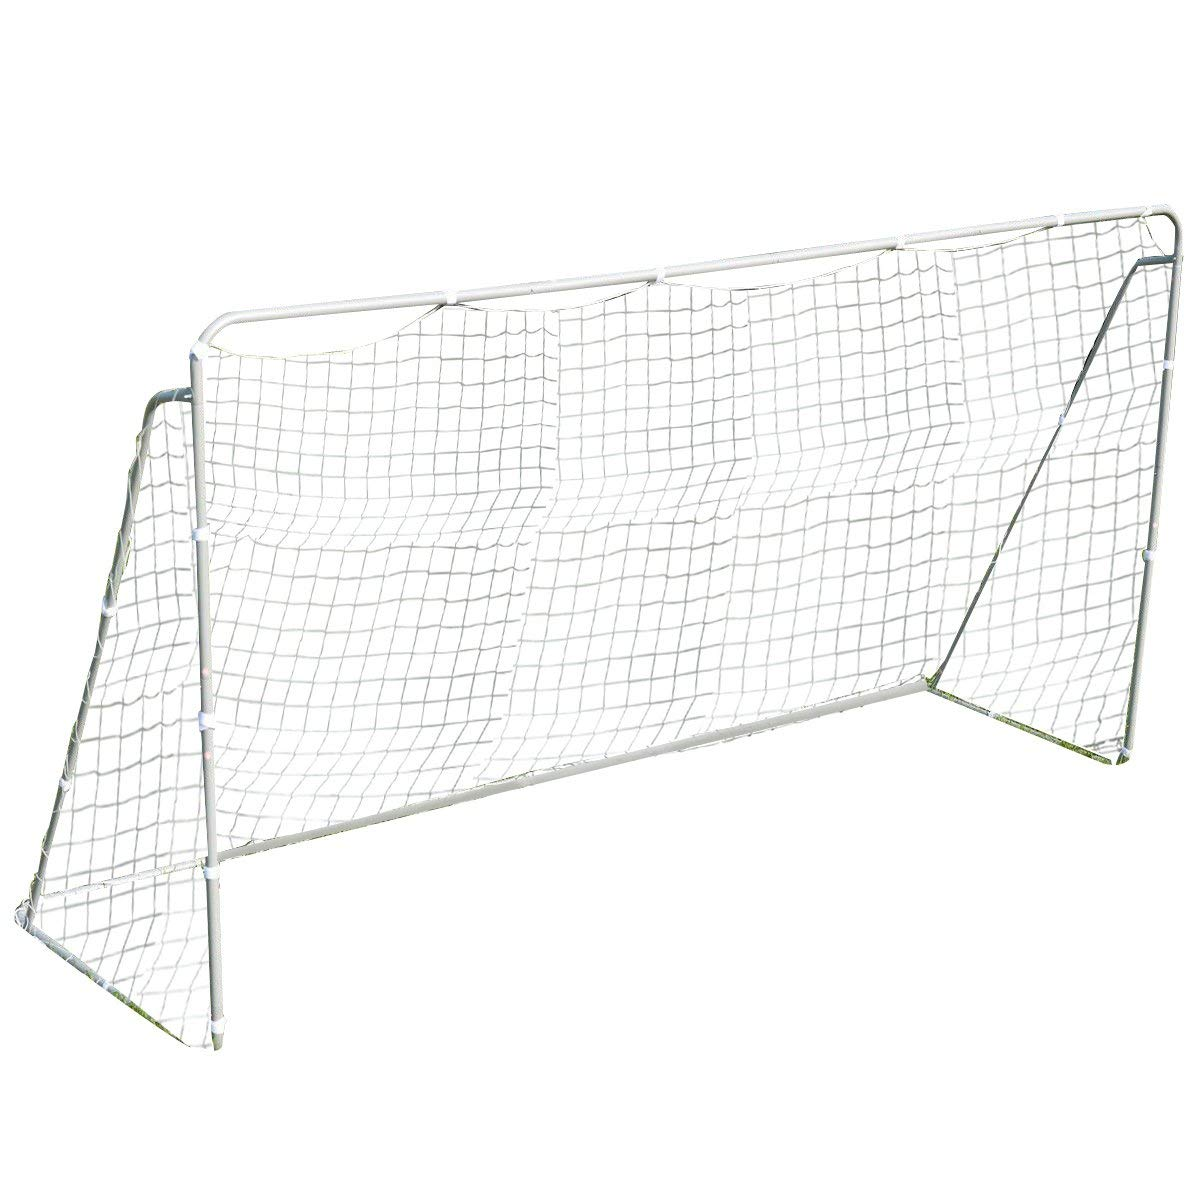 Giantex 12 x 6 Ft Soccer Goal w/ Net, Steel Frame and Velcro Straps, Indoor Outdoor Backyard Kids Children Soccer Goal by Giantex (Image #2)